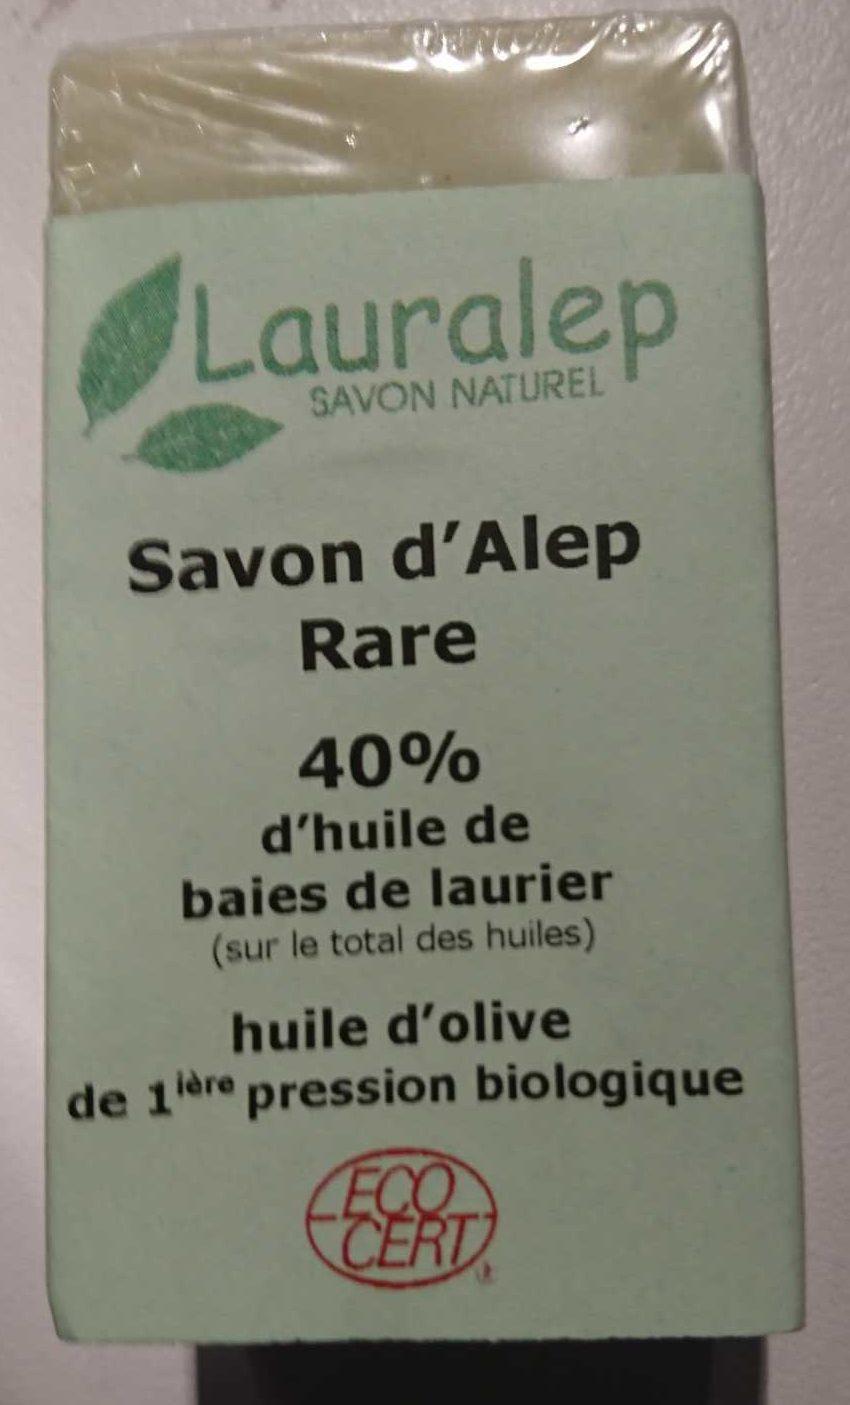 Savon d'alep rare 40% - Product